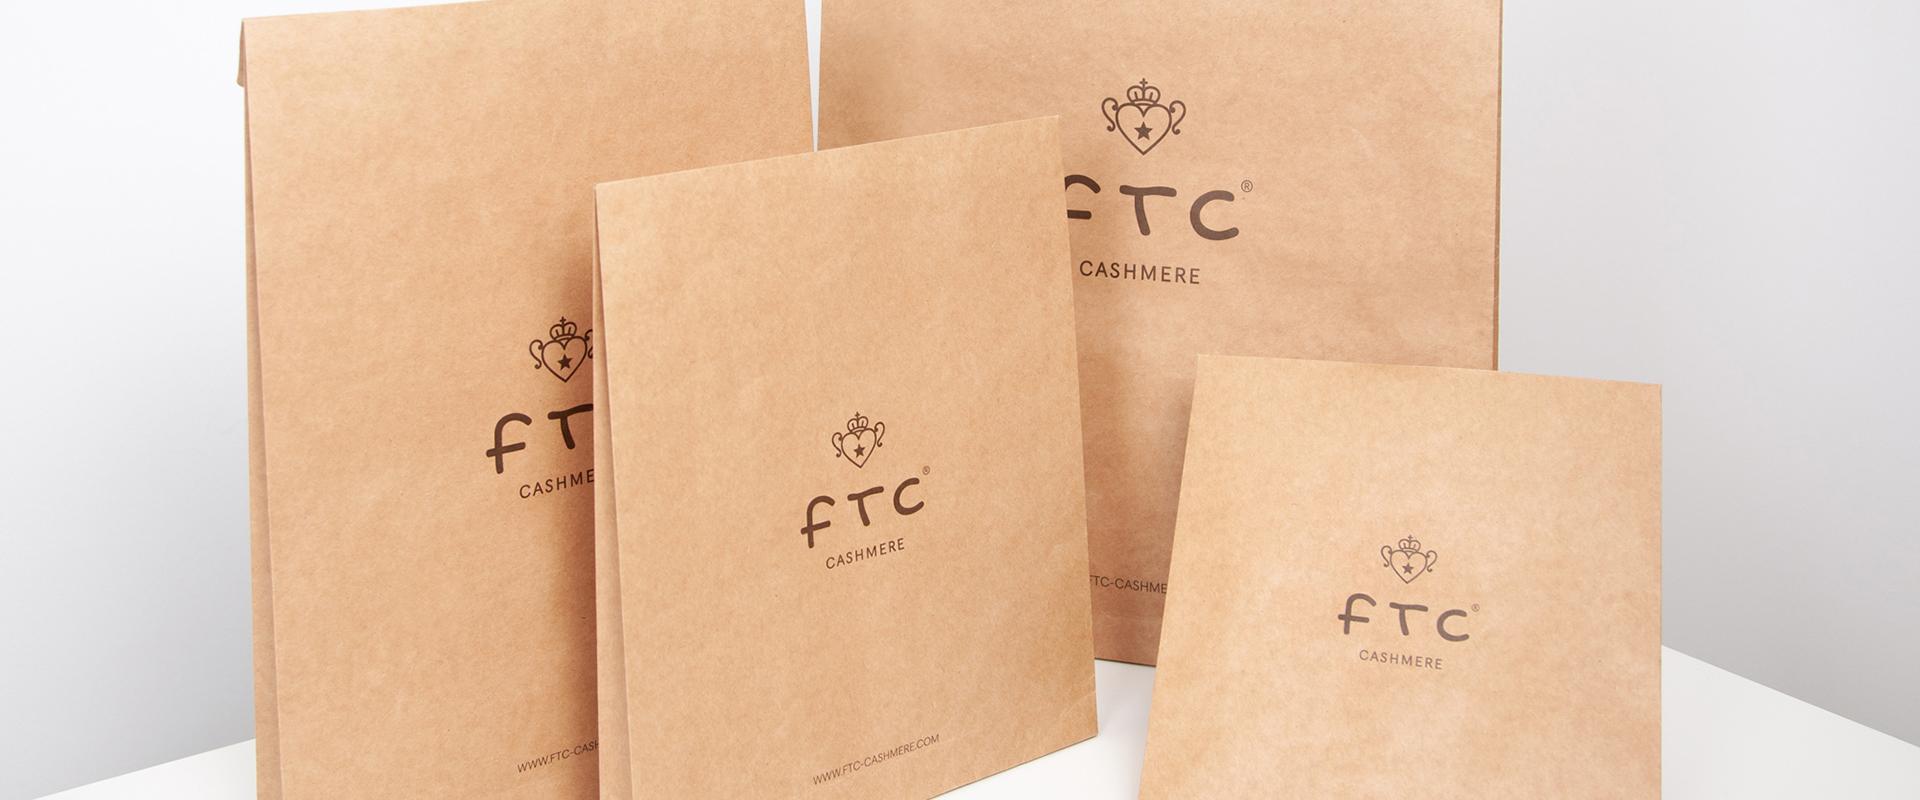 ftc-cashmere_verantwortung_manufaktur_kaschmir_fsc-zertifiziert_papier_zeroplastik